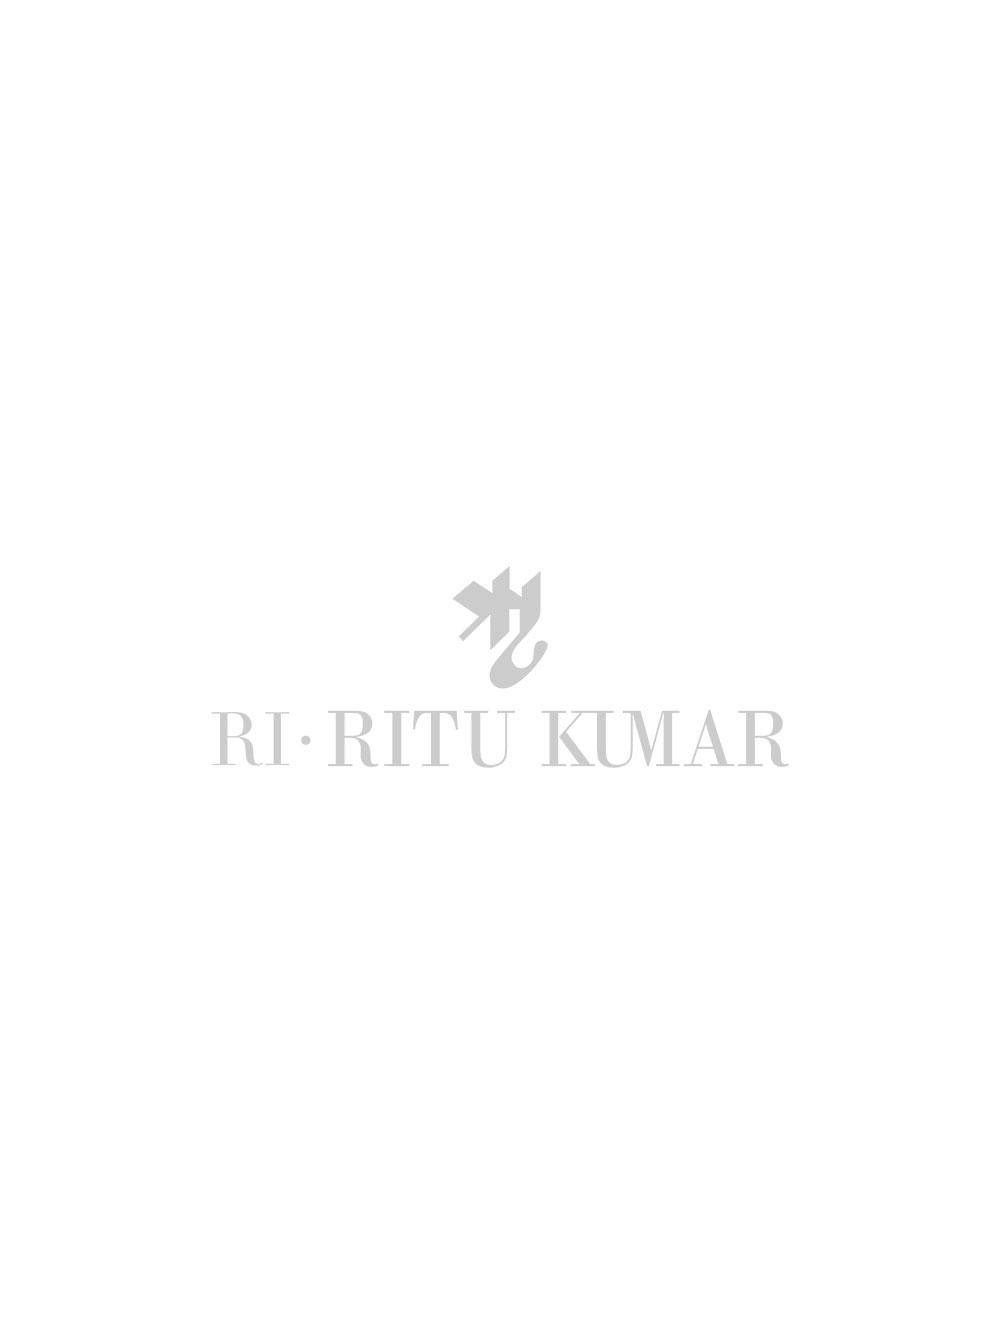 Teal & Mauve Zardozi Velvet Suit Set